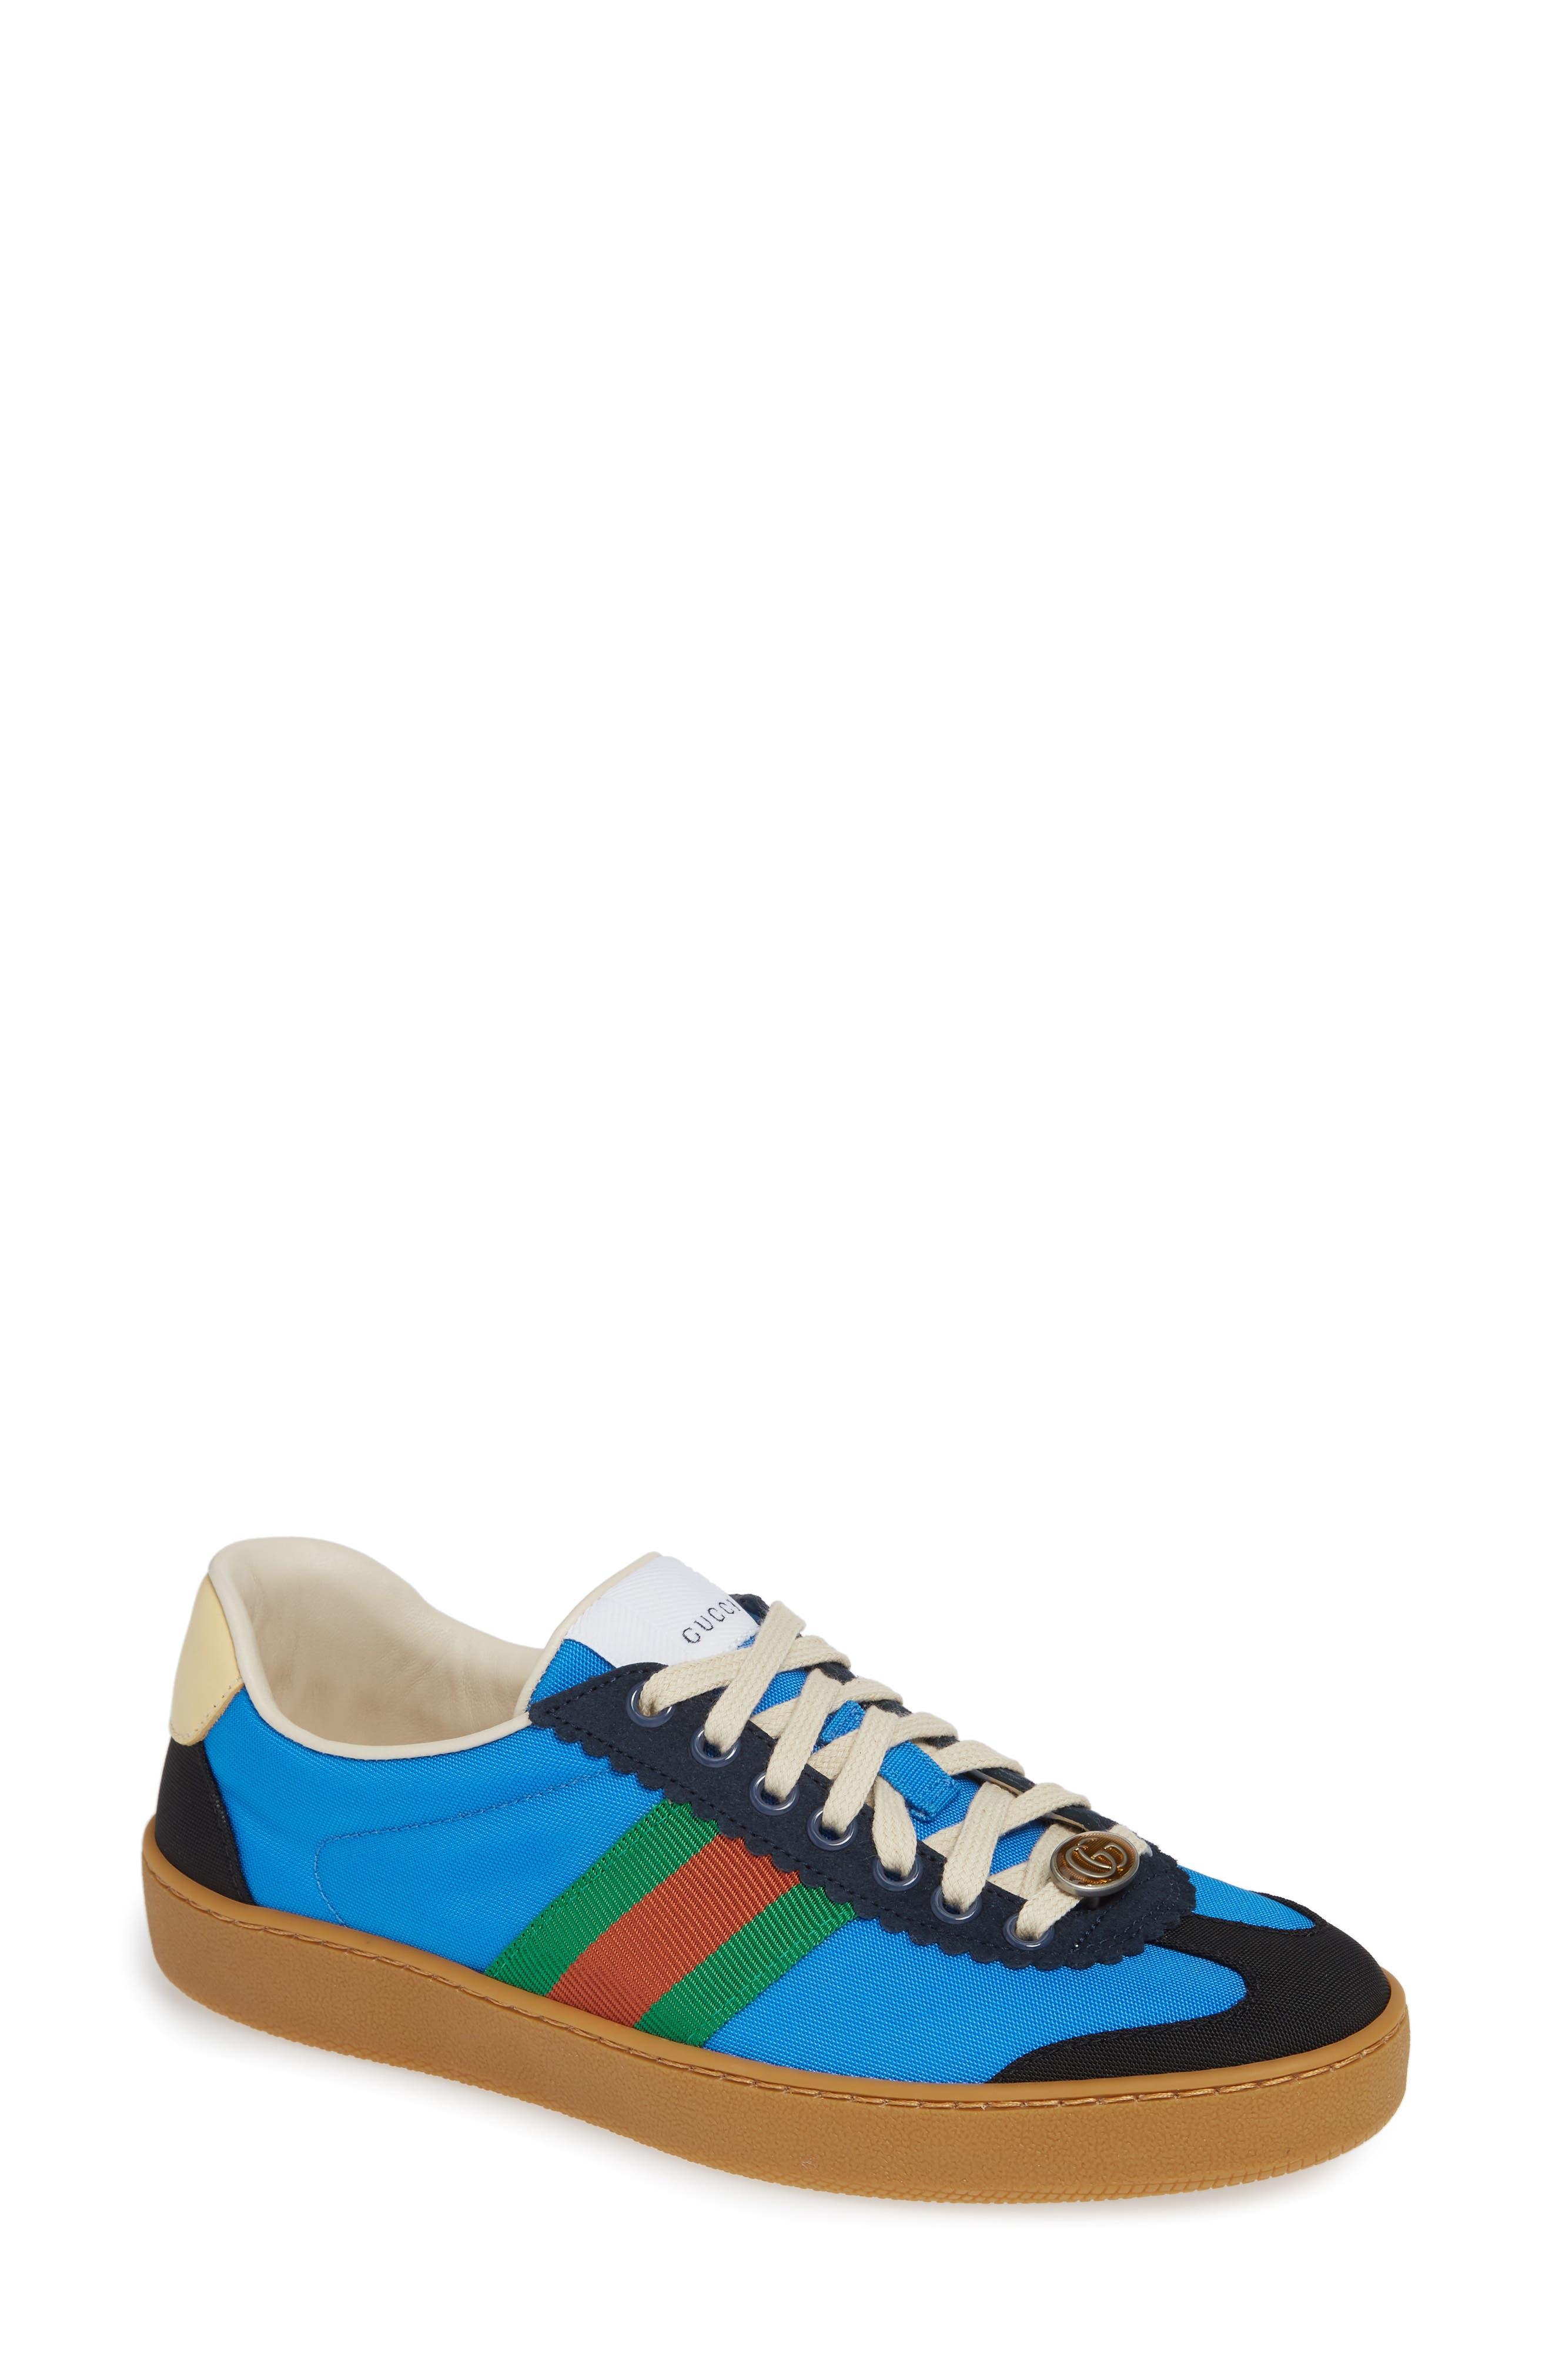 GUCCI, G74 Low Top Sneaker, Main thumbnail 1, color, 400